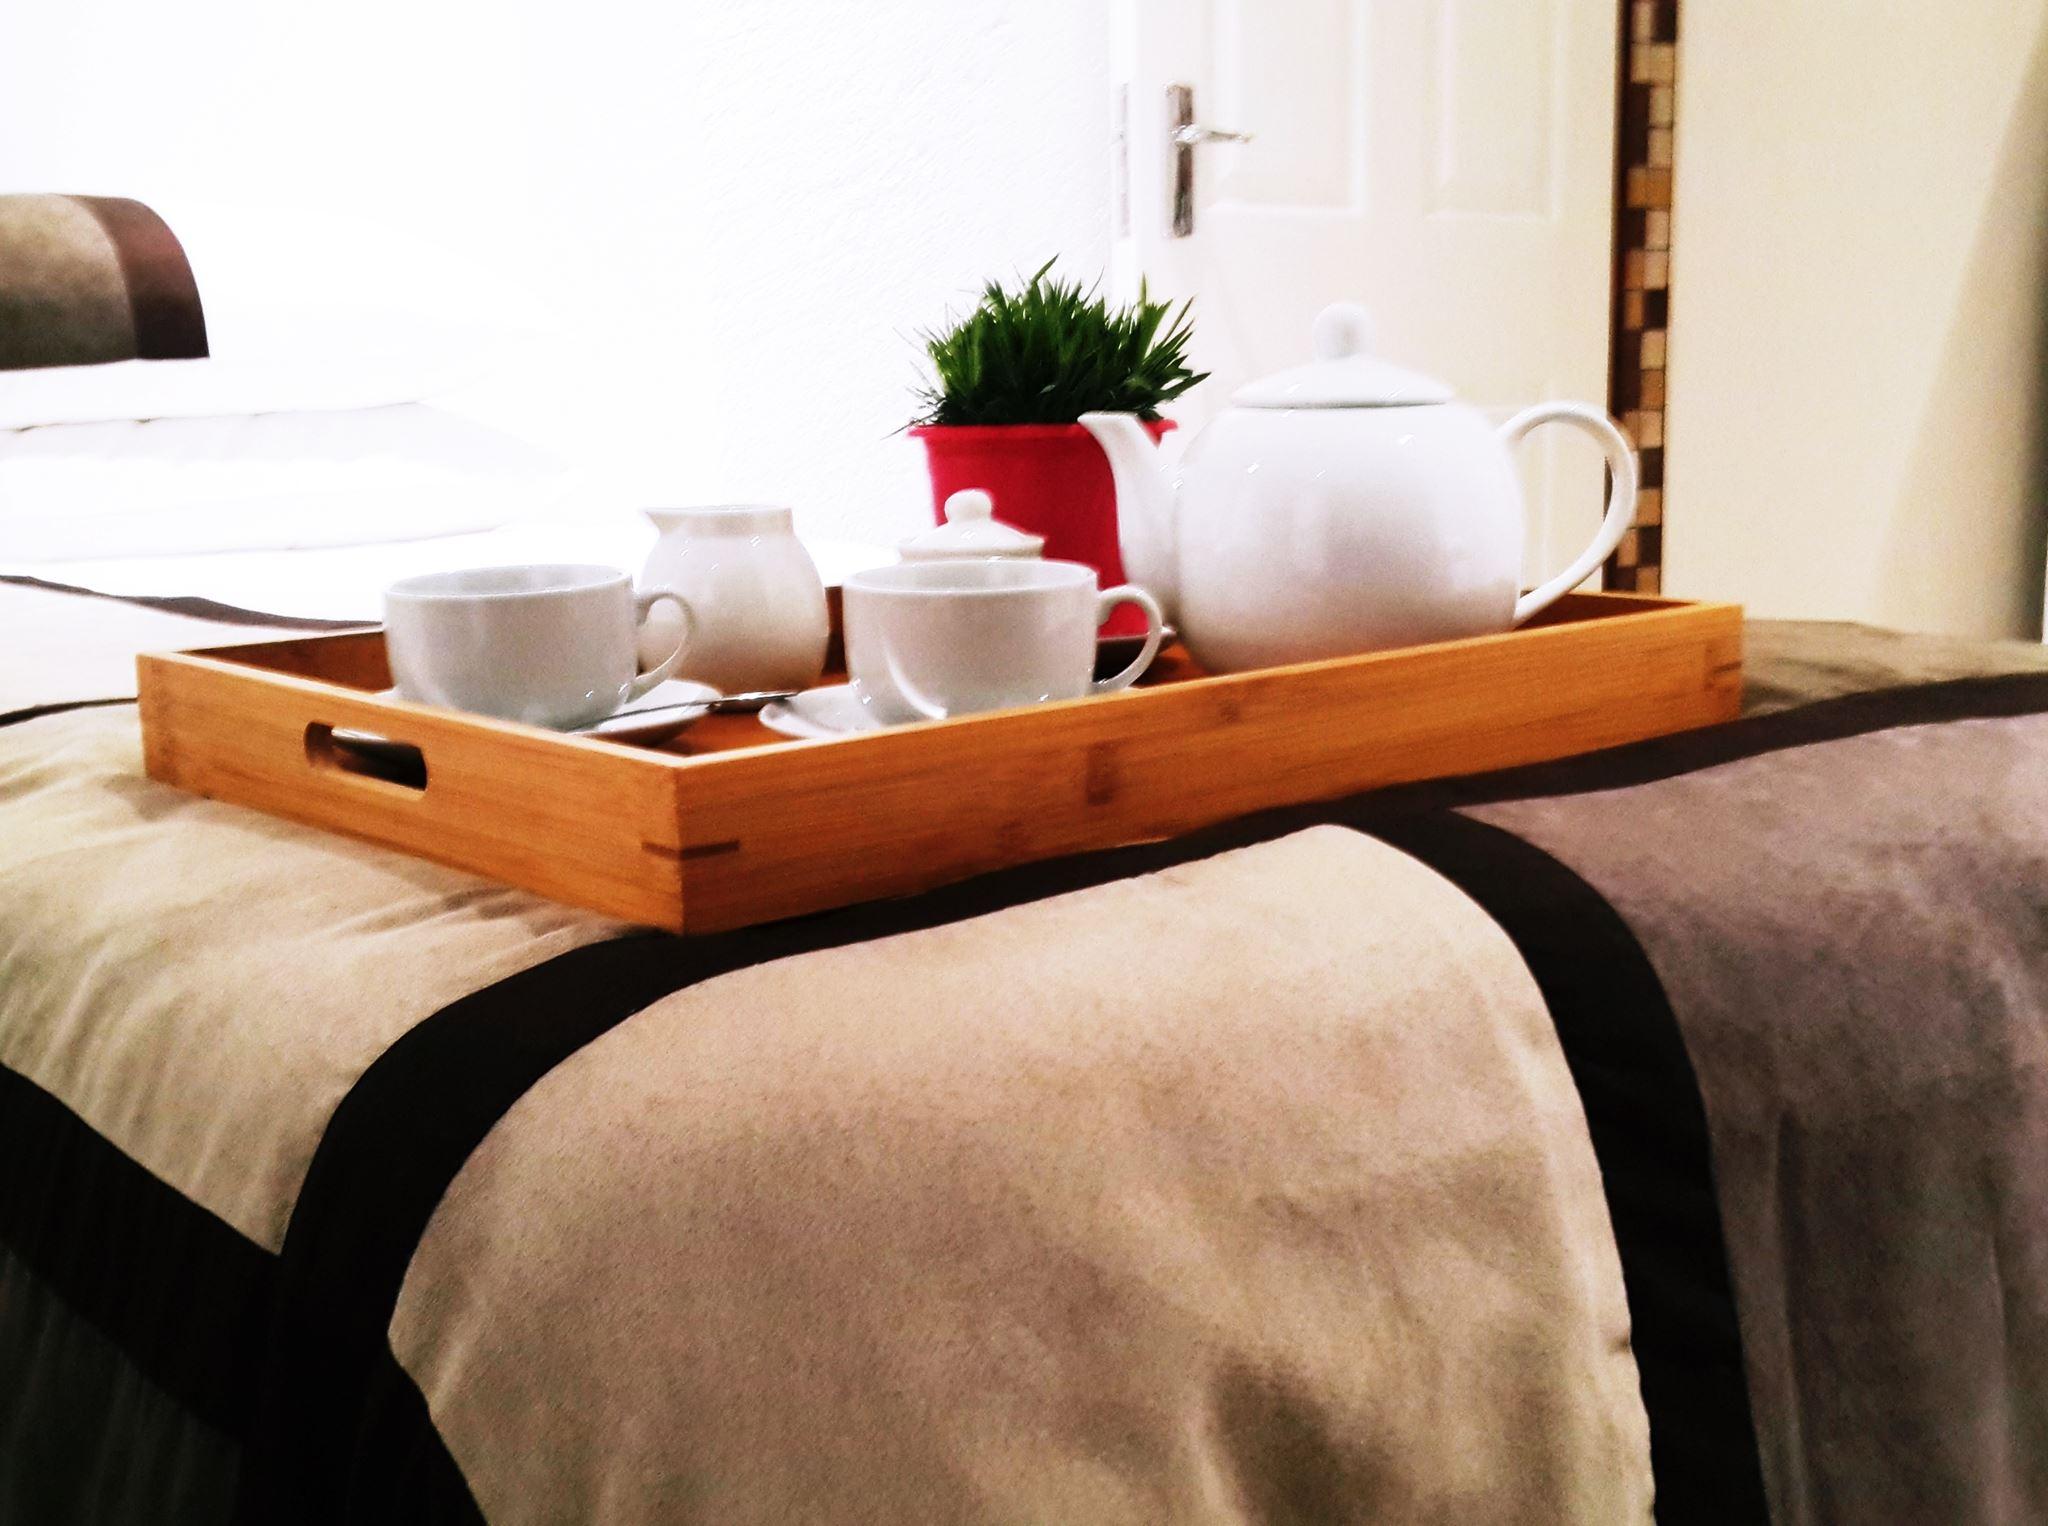 Vooruitzigt Self-Catering Apartments